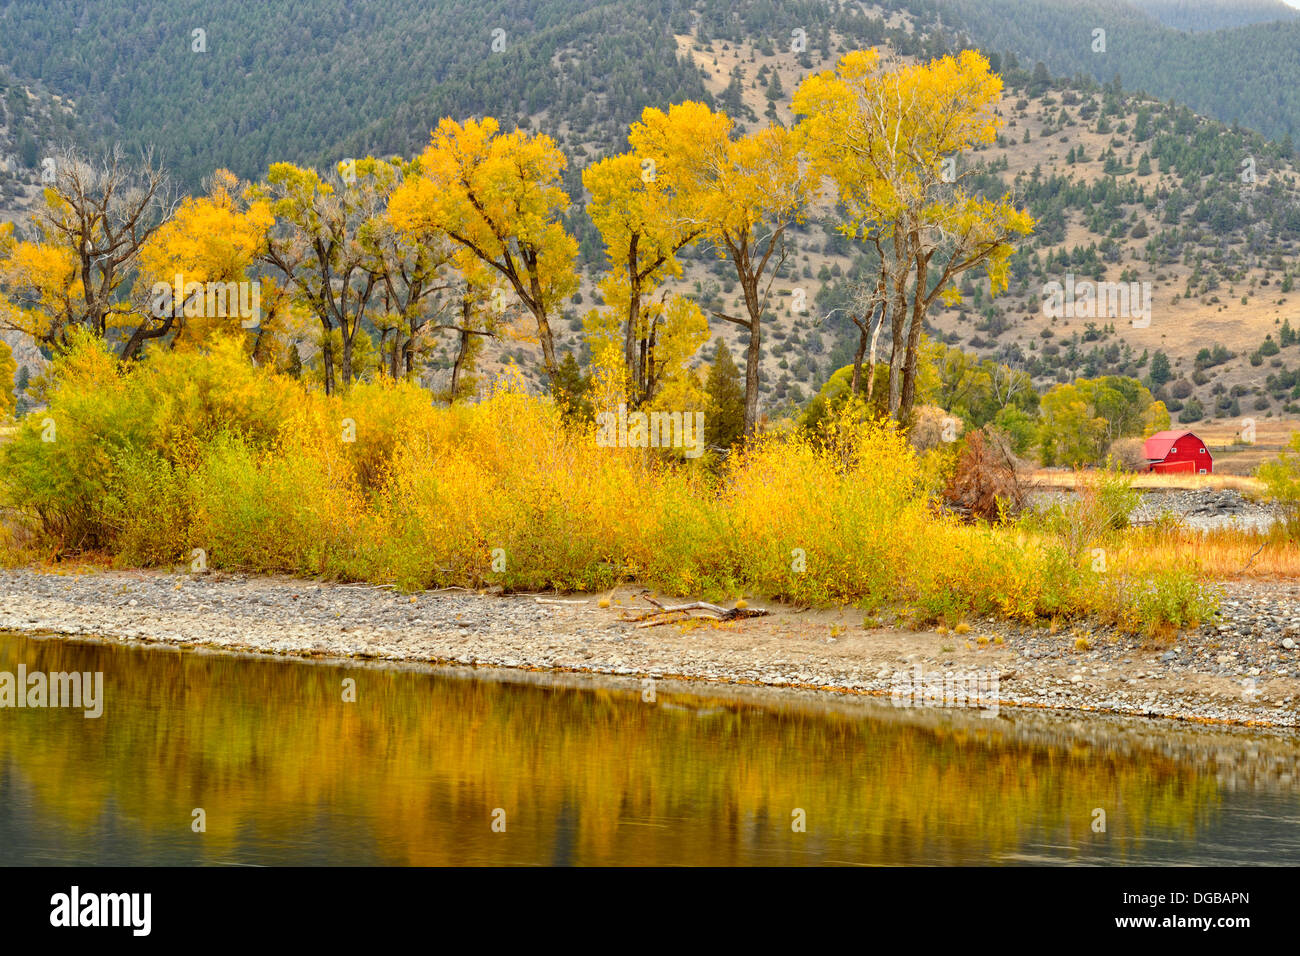 Autumn foliage on cottonwoods along the Yellowstone River near de Puy Spring Creek Livingston Montana USA - Stock Image